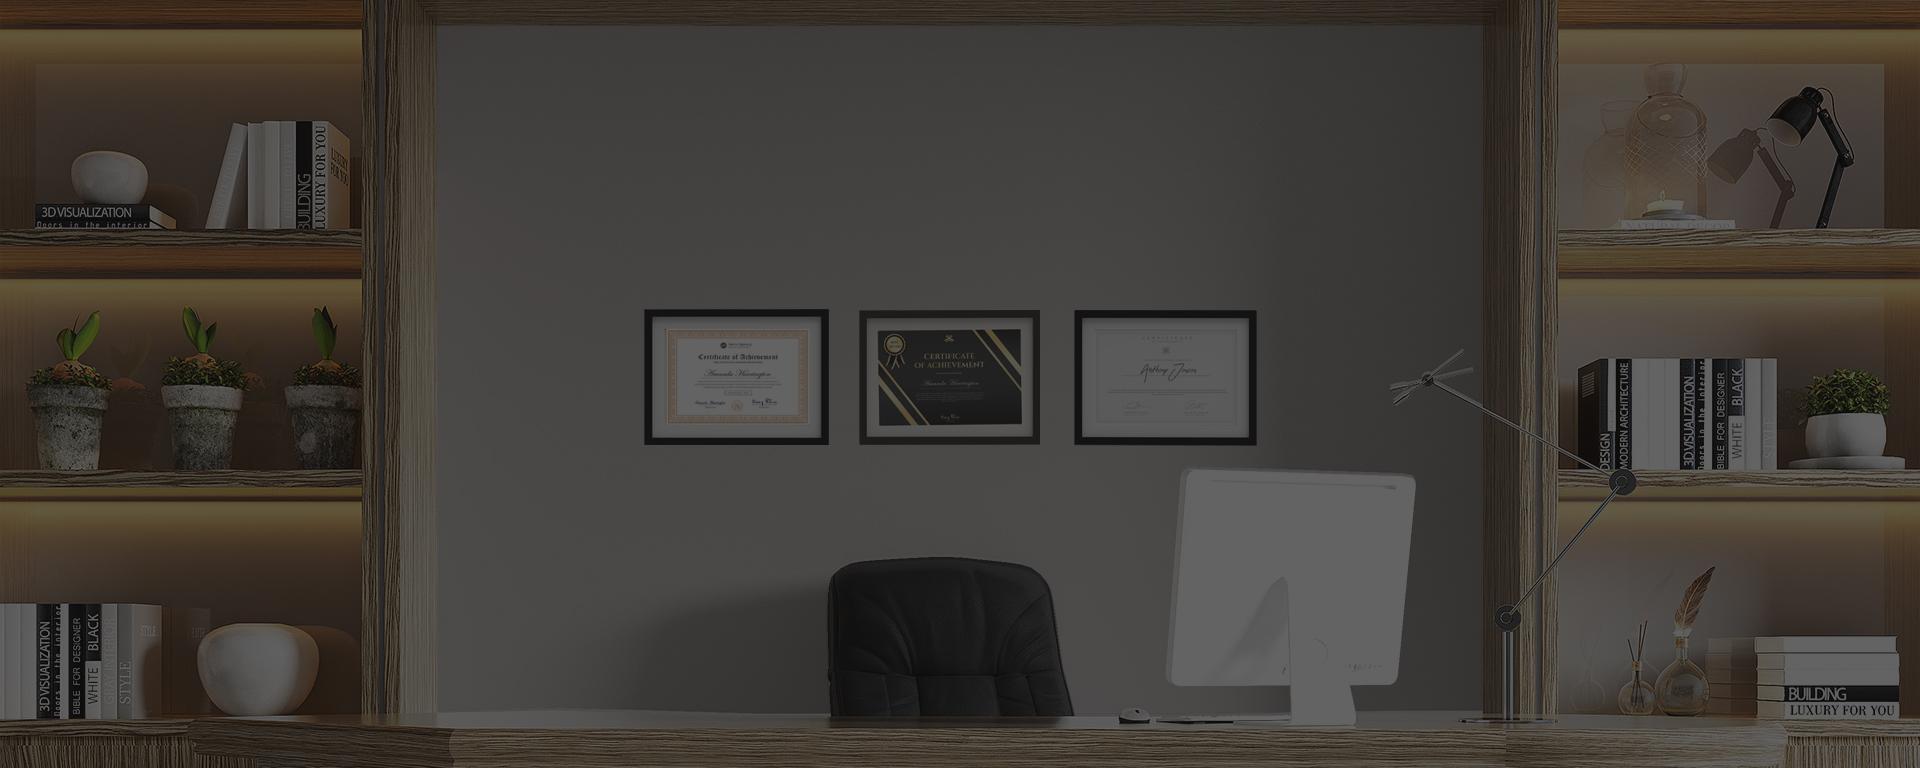 awards-documents